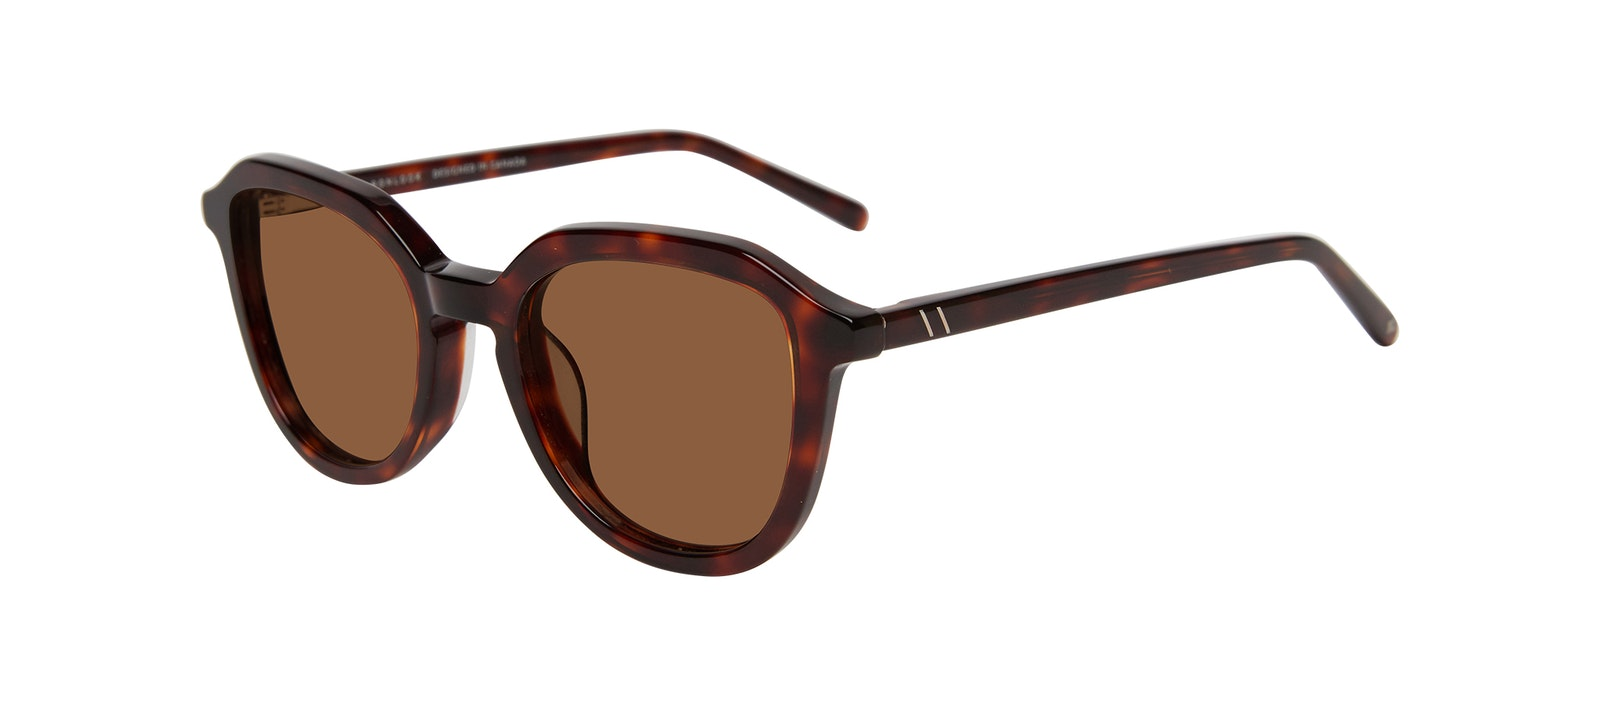 Affordable Fashion Glasses Square Sunglasses Kids Art Junior Tortoise Tilt